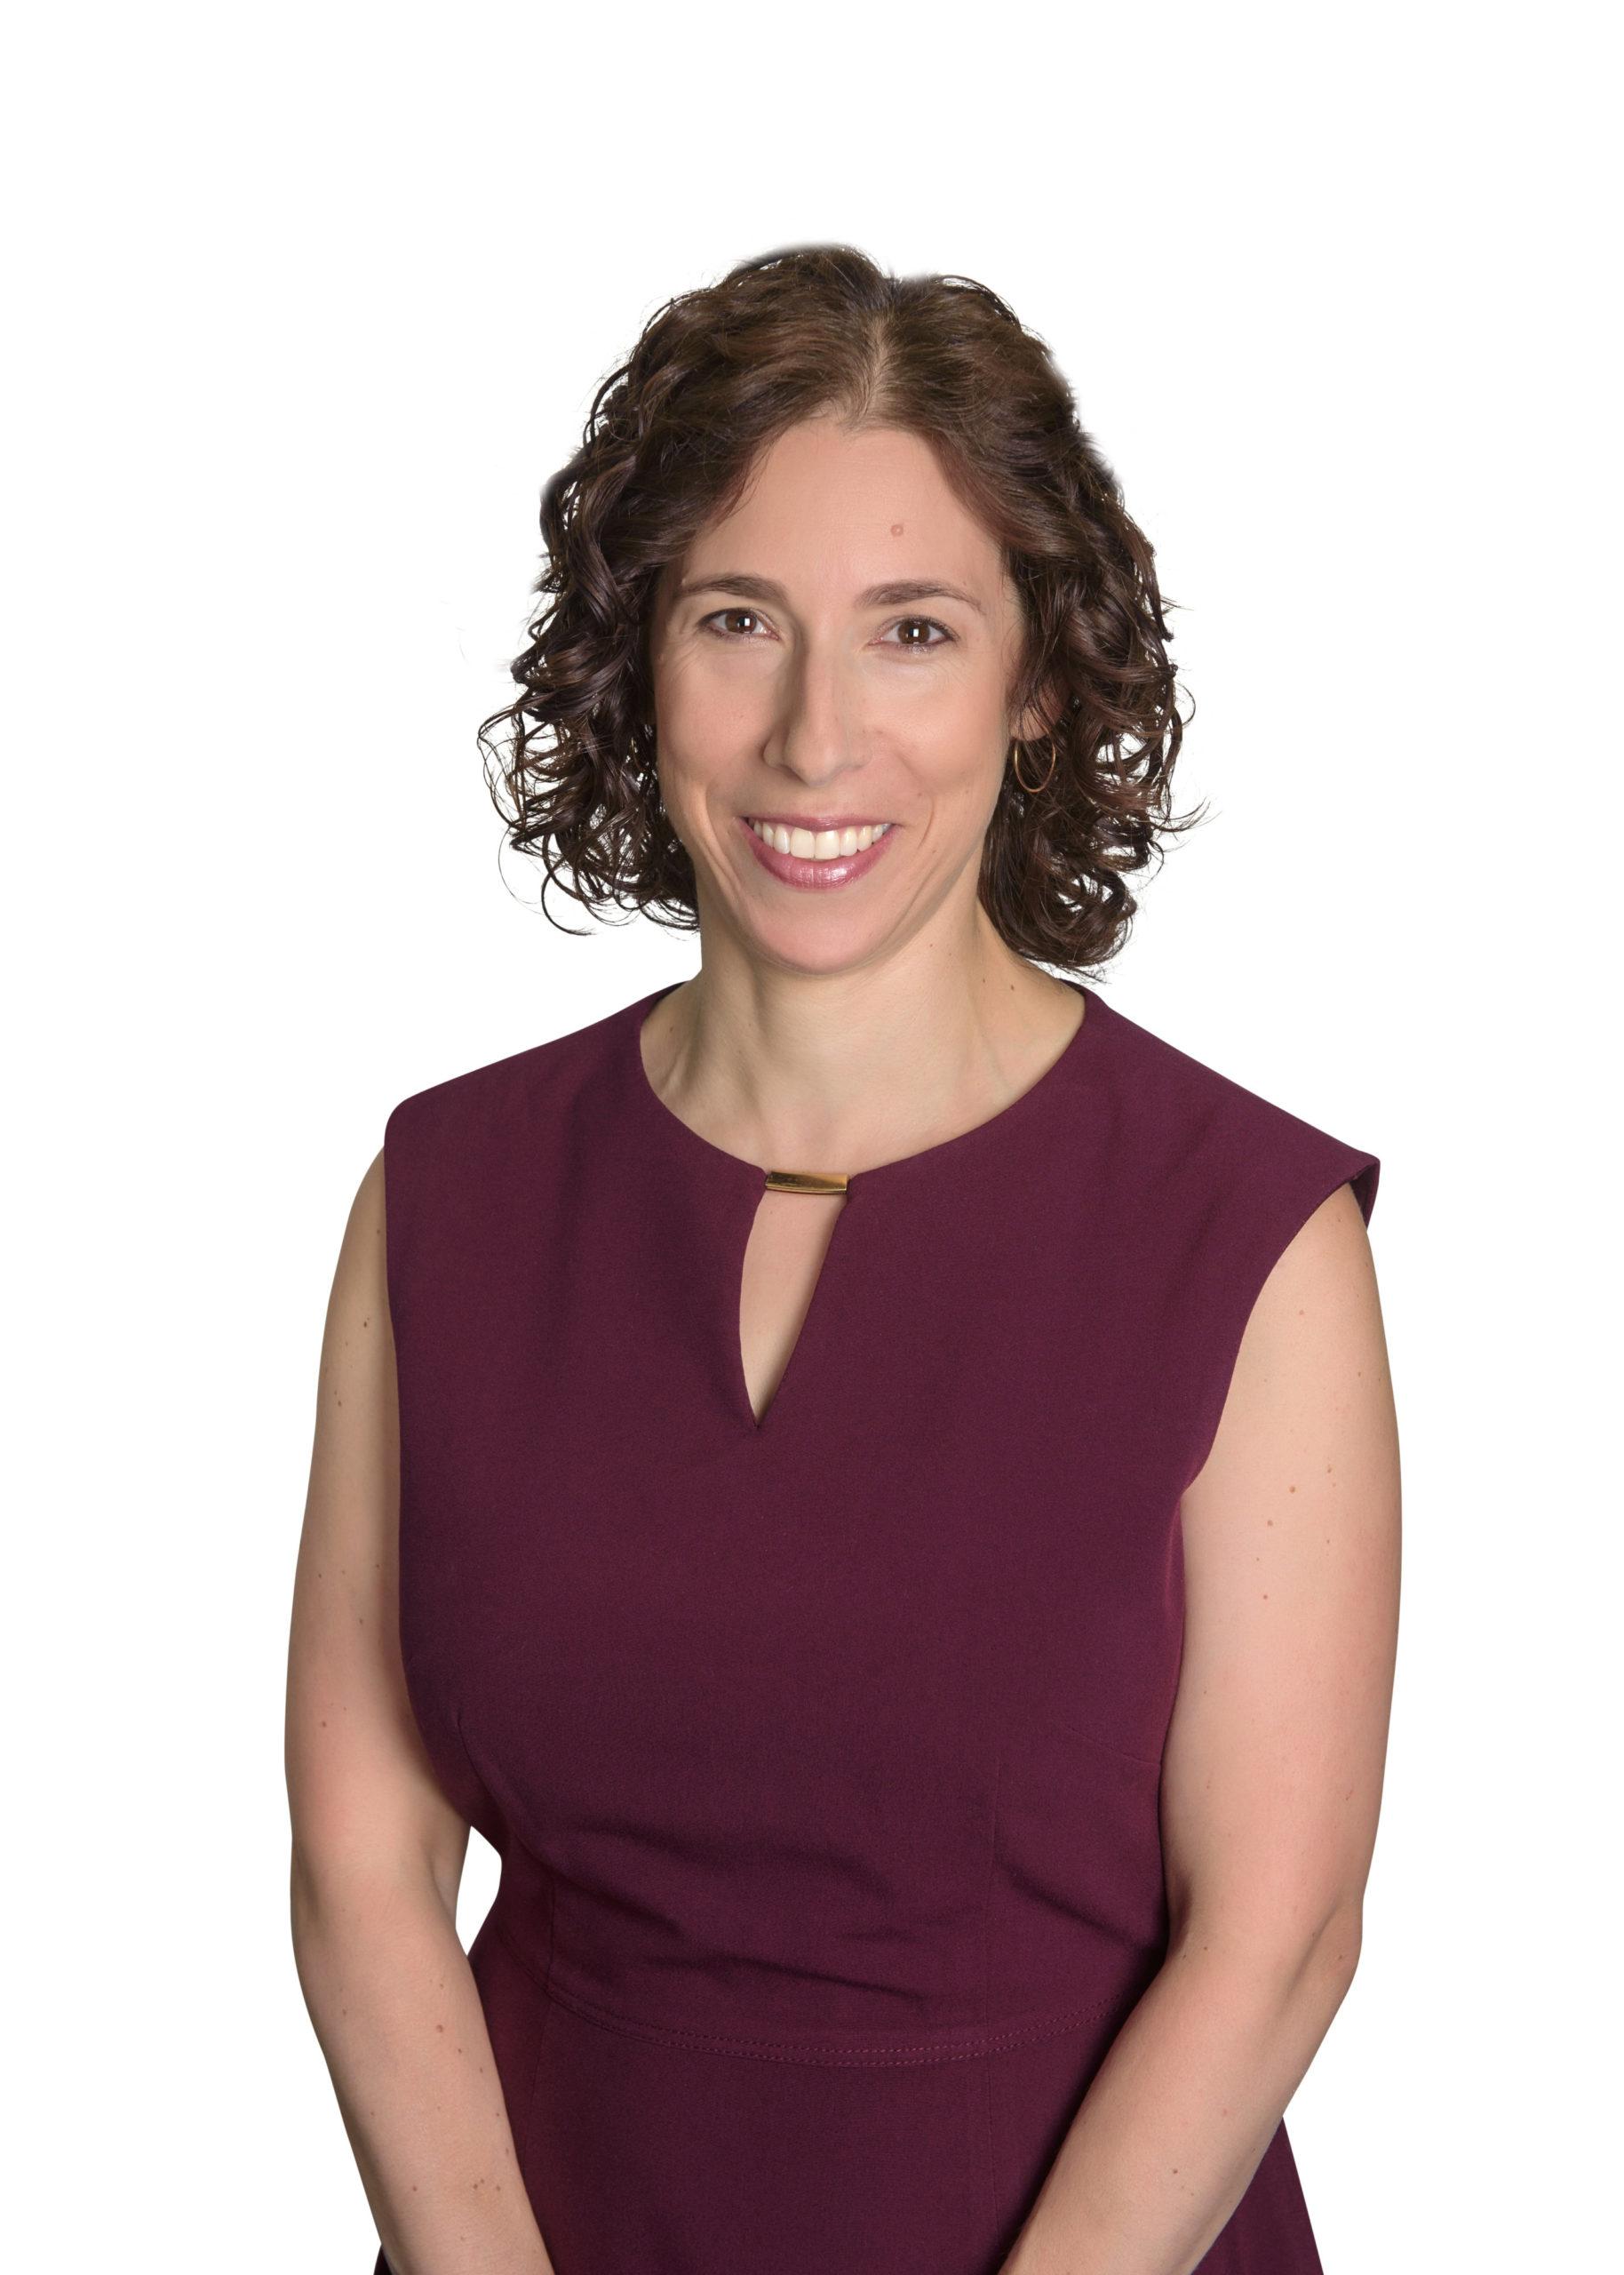 Rebecca C. Shankman